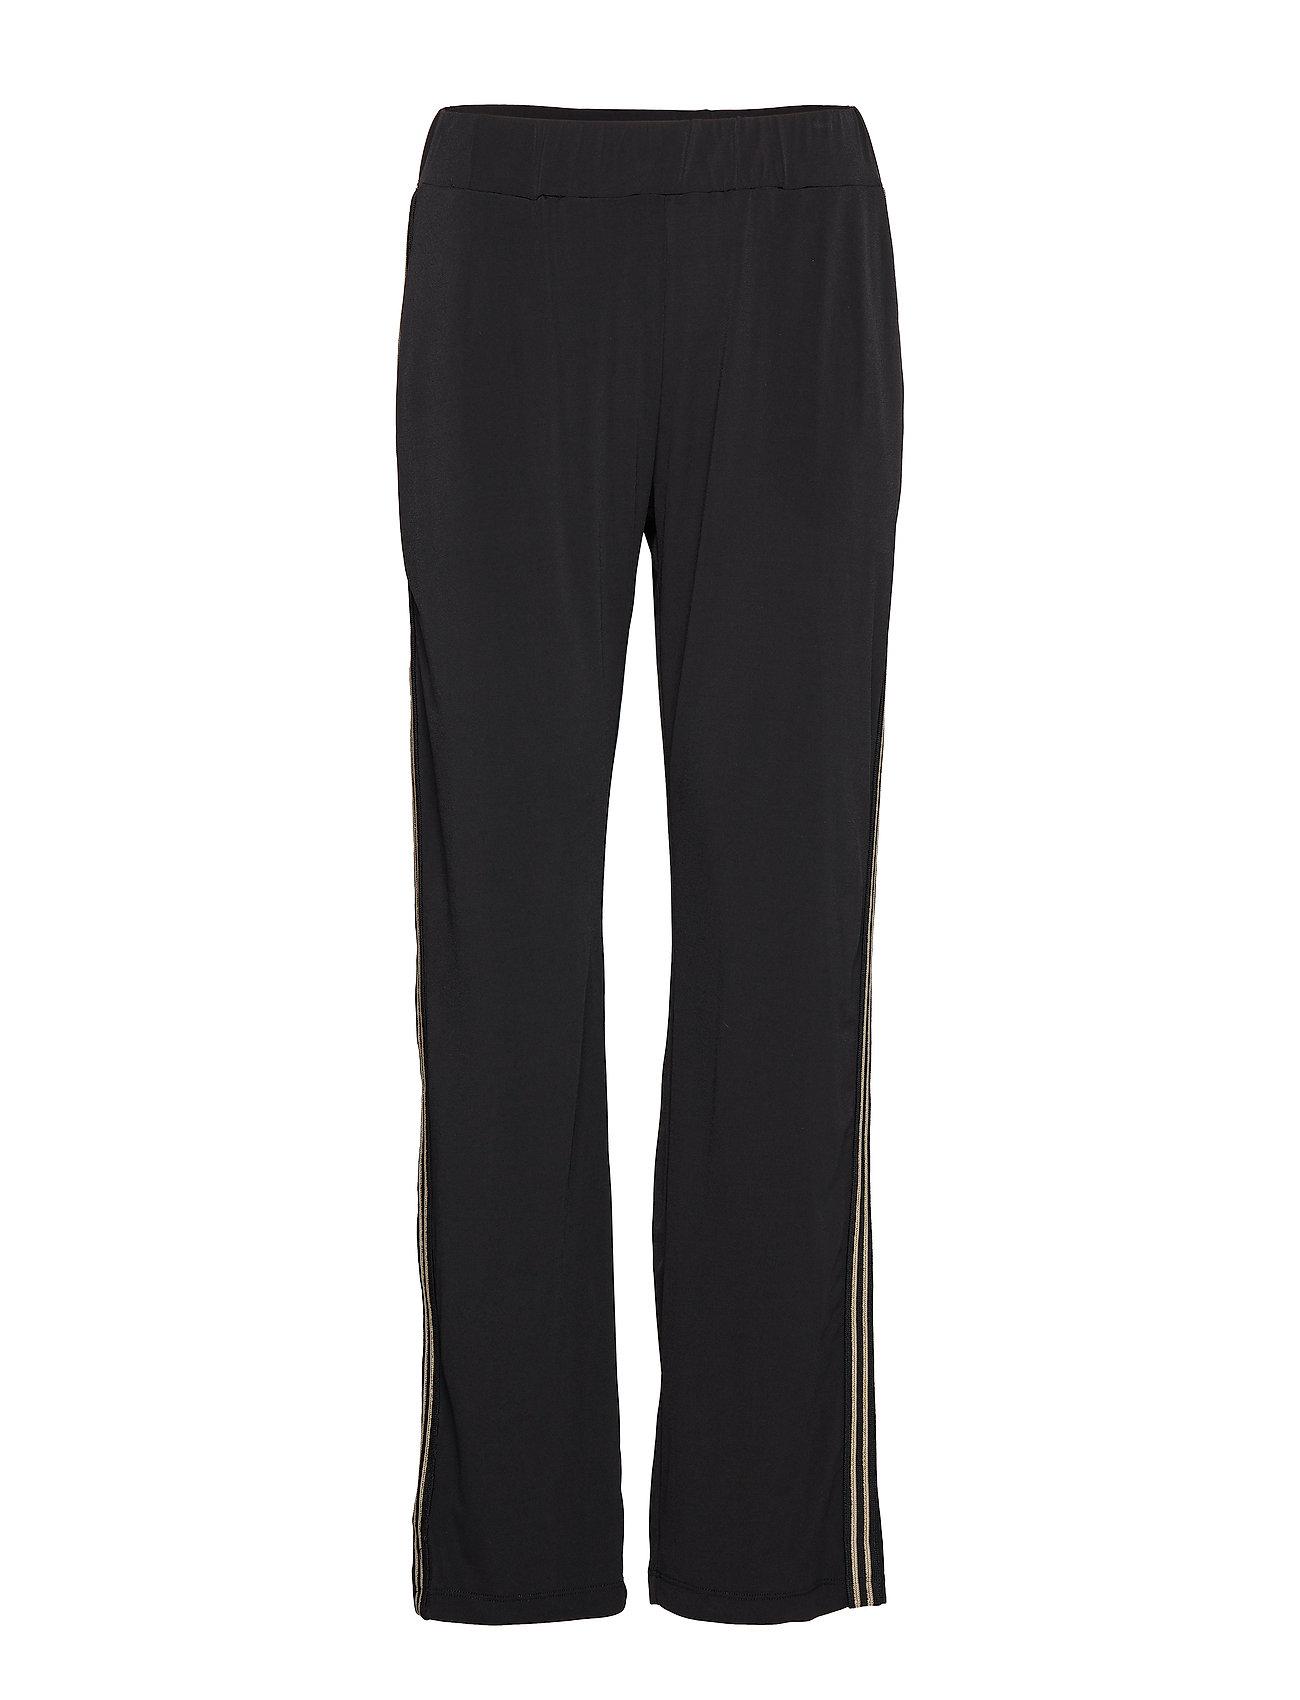 Cream Omina Pants - PITCH BLACK